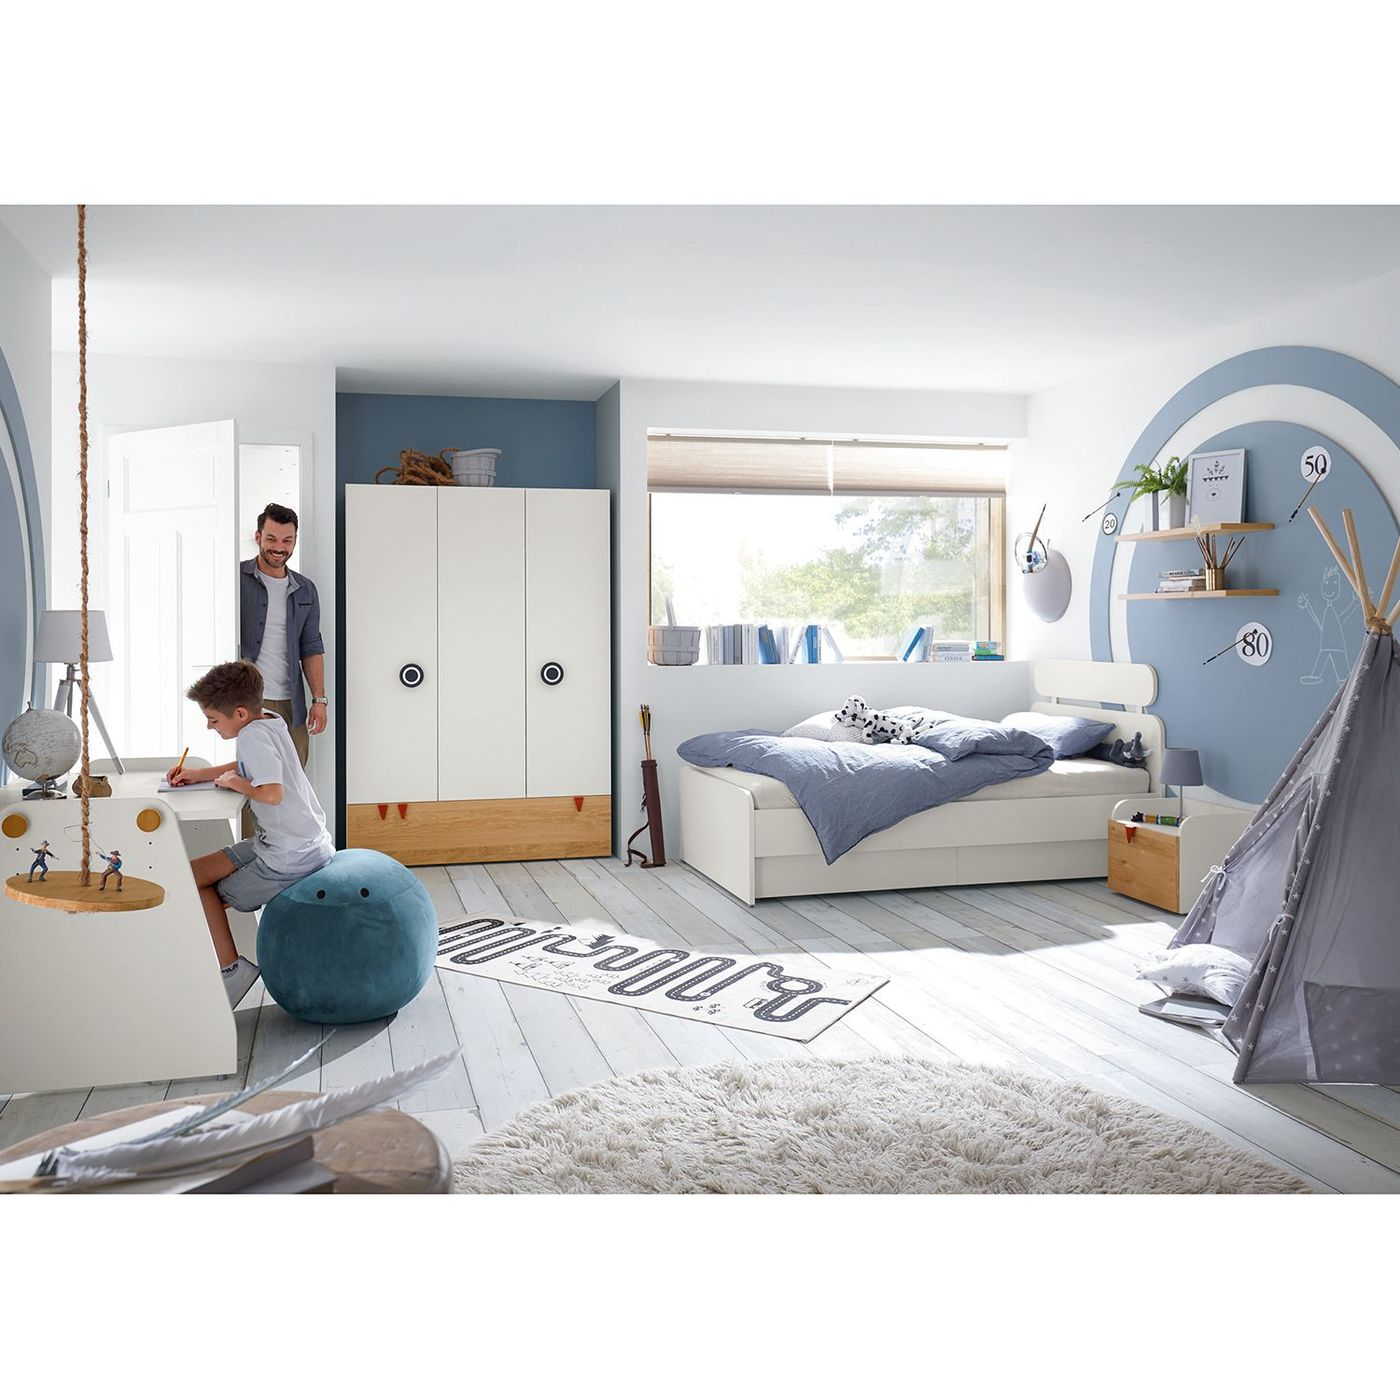 Full Size of Kinderbett Mädchen Ideen Und Inspirationen Fr Kinderbetten Betten Bett Wohnzimmer Kinderbett Mädchen